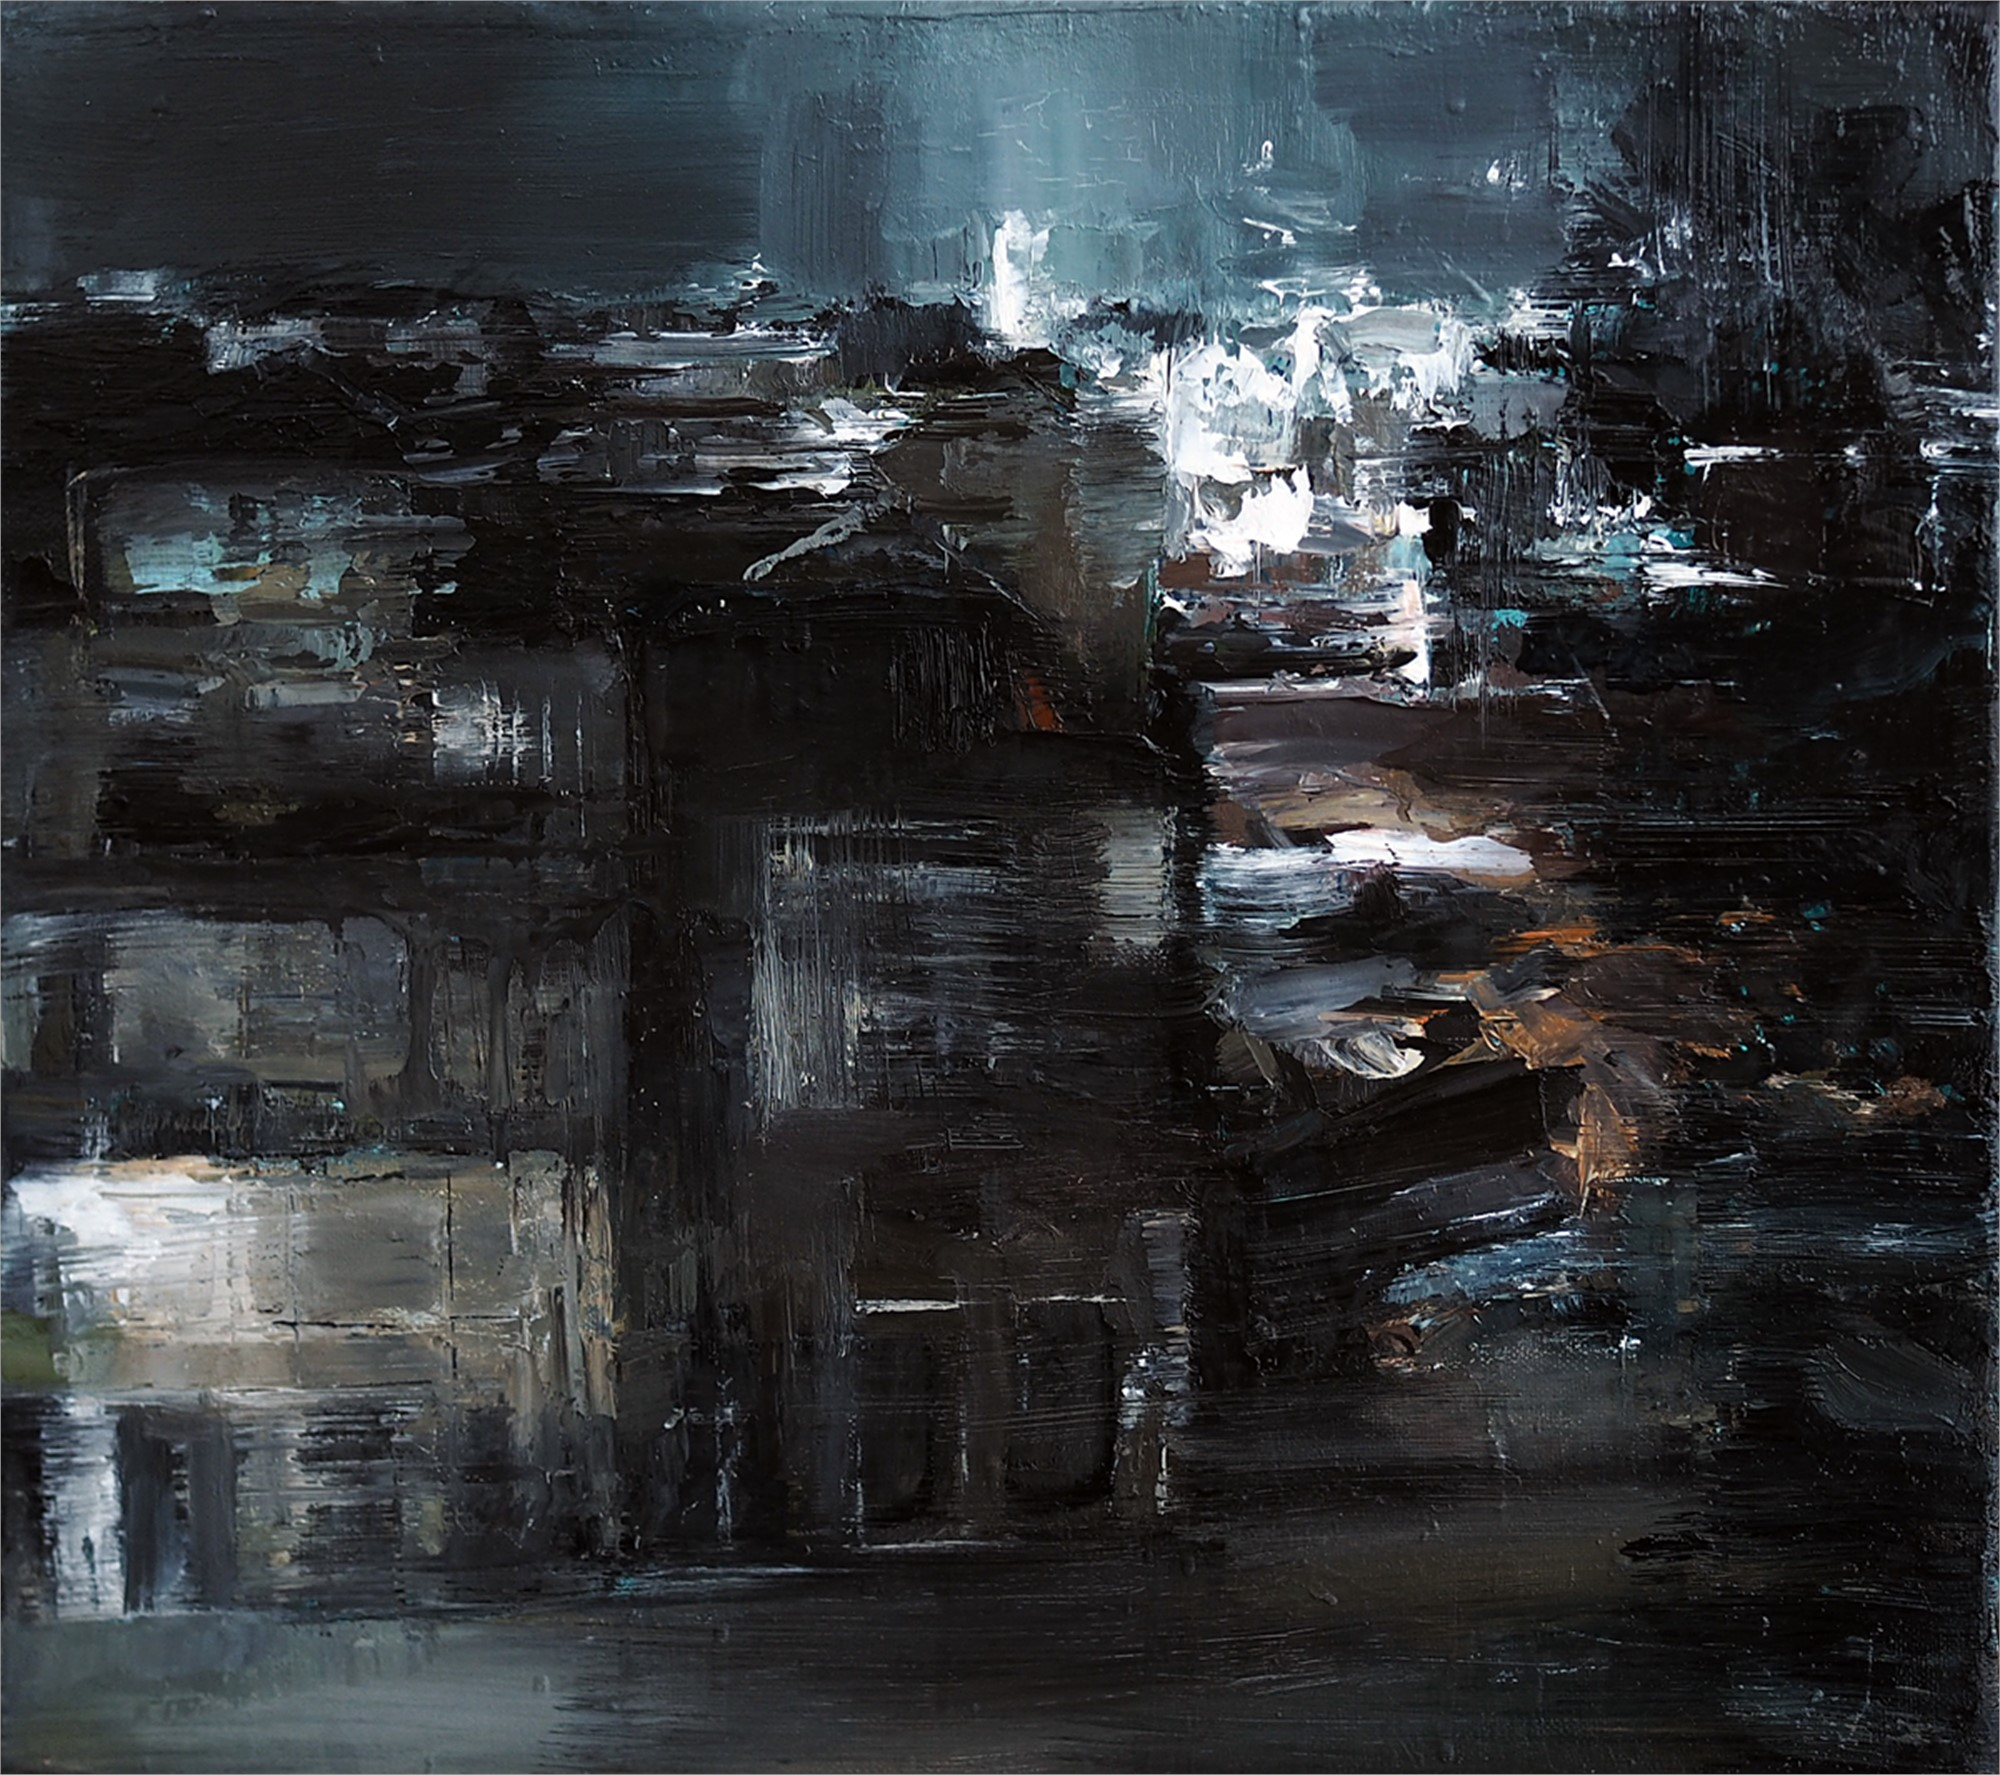 Porto I by Heiko Mattausch